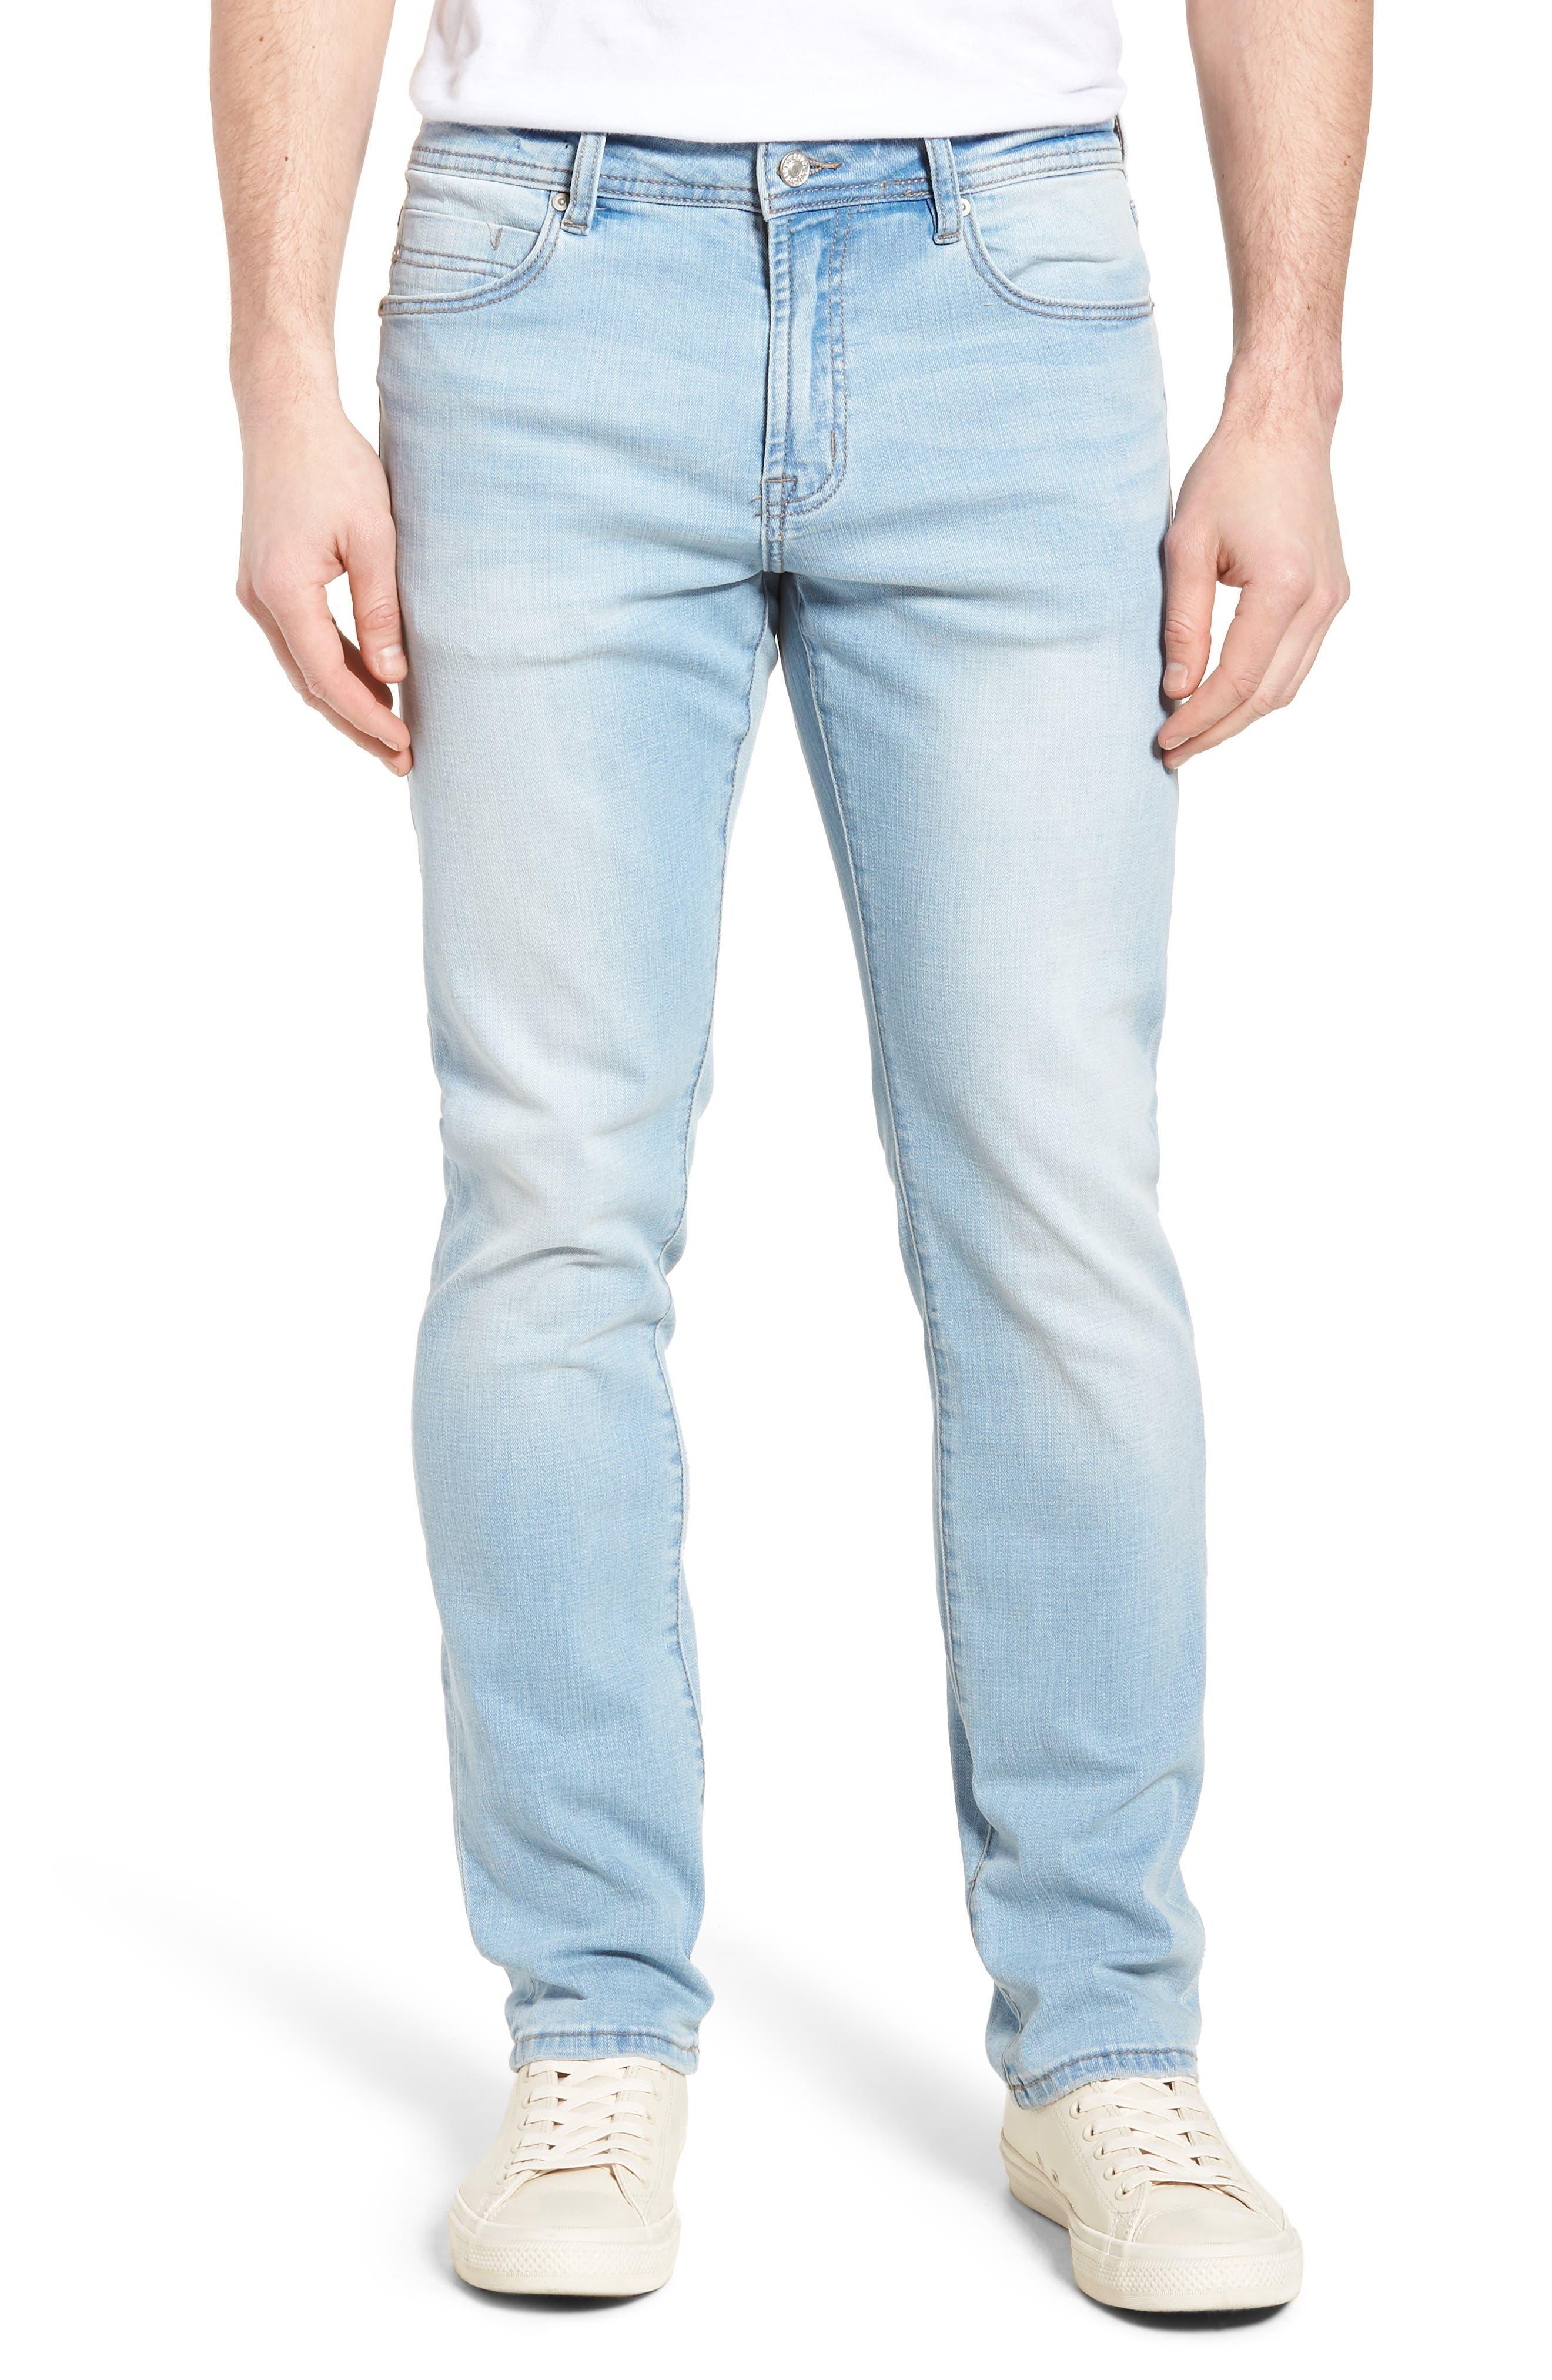 Jeans Co. Straight Leg Jeans,                             Main thumbnail 1, color,                             Riverside Light